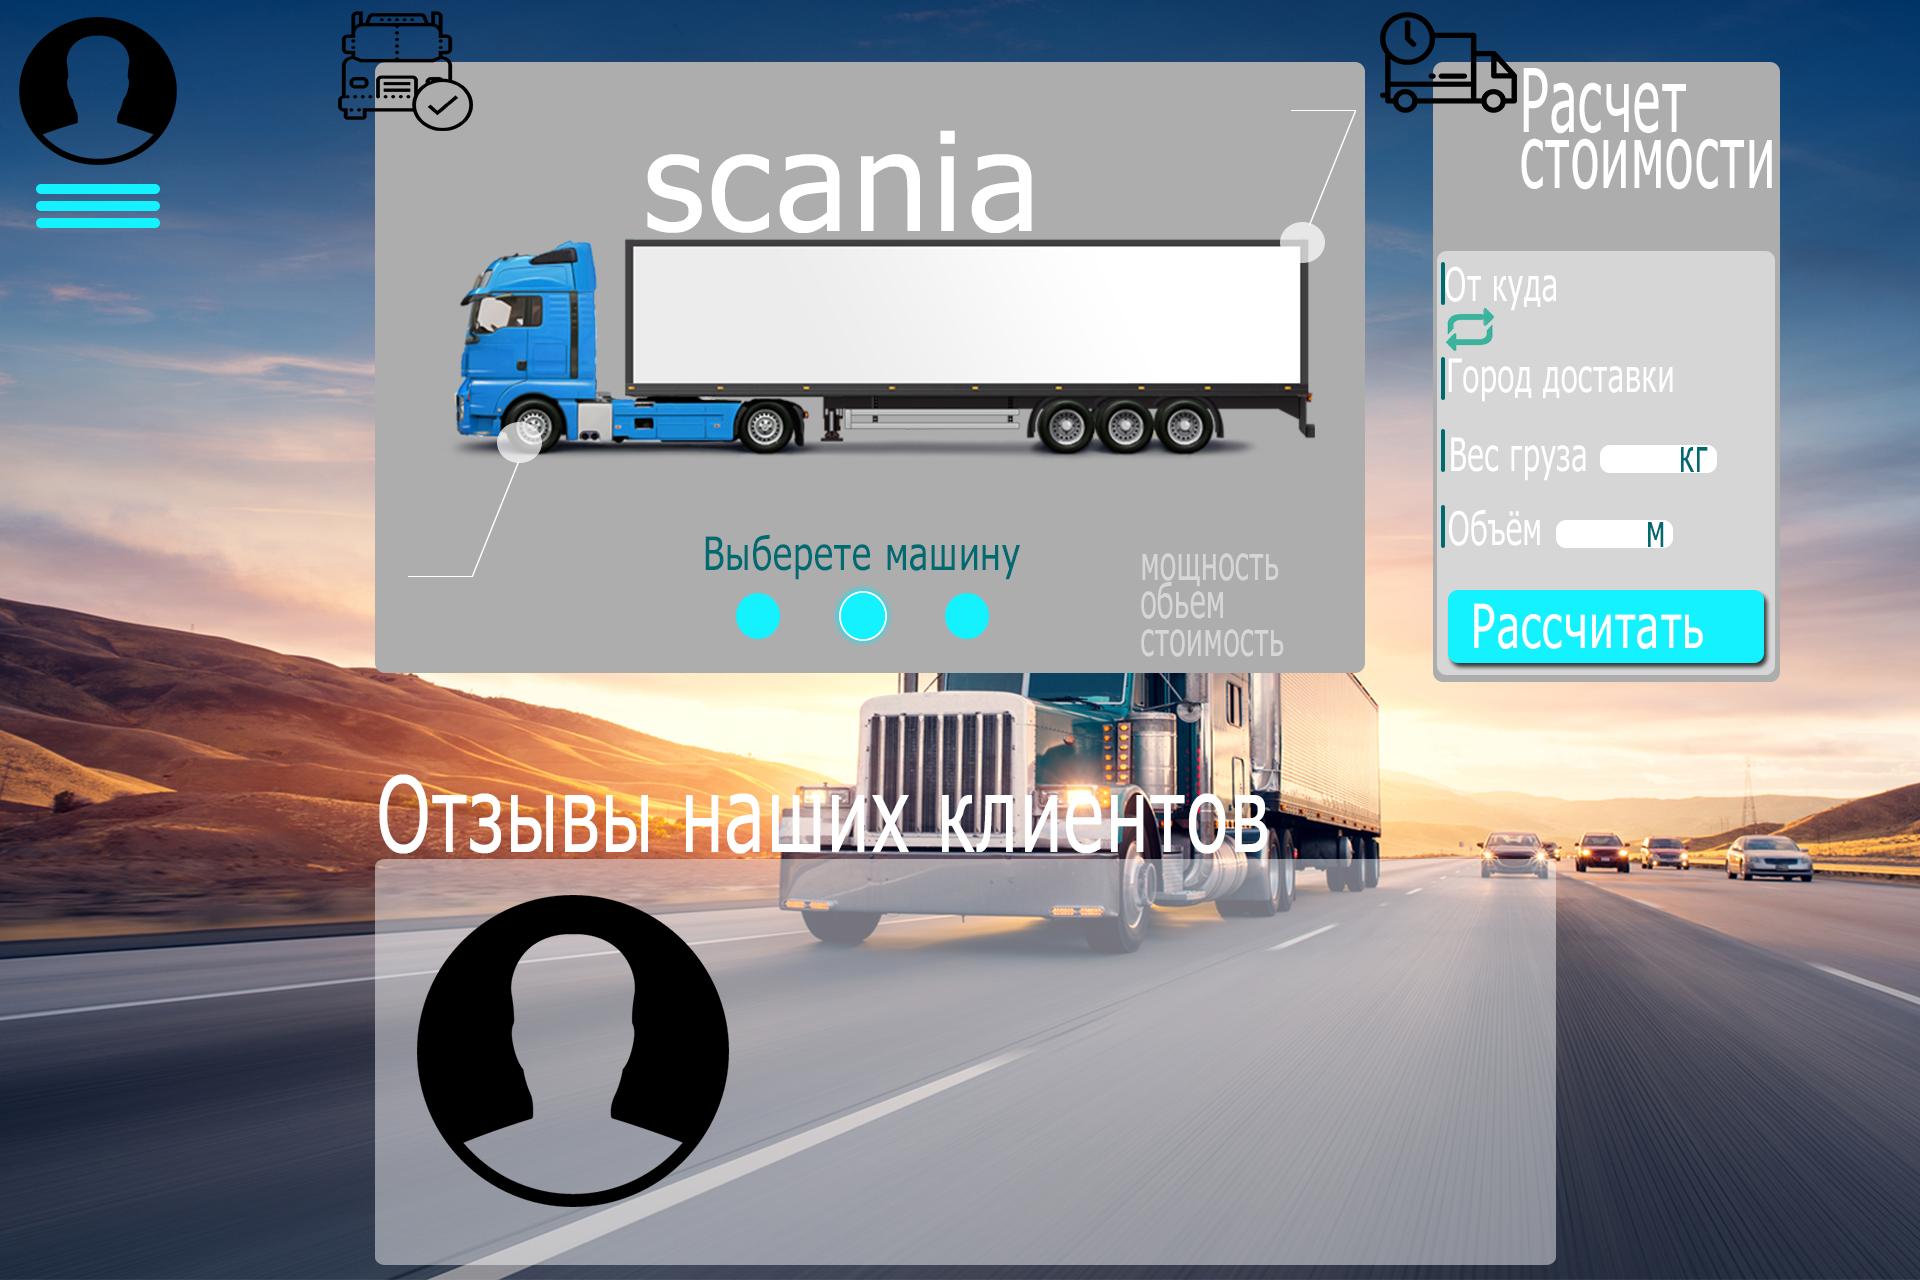 Дизайн сайта транспортно-экспедиторской компании ЛогикТранс фото f_9095a45047caf806.png